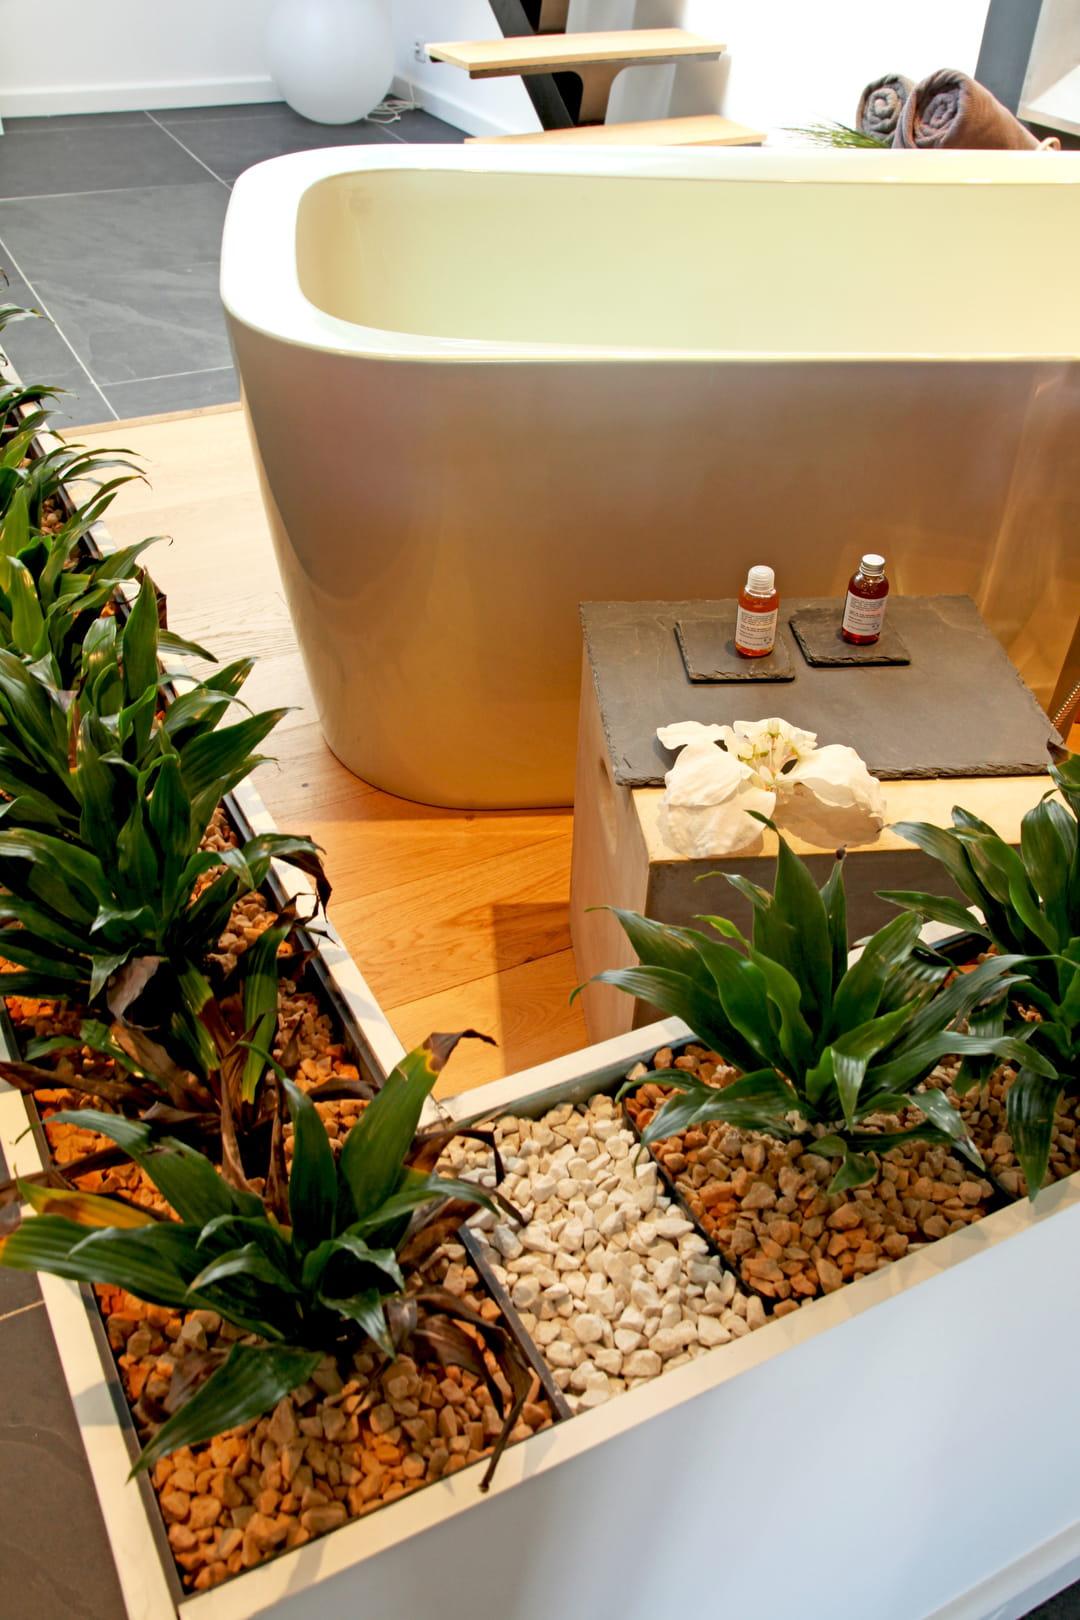 Comment cr er une salle de bains zen for Plante bambou salle de bain